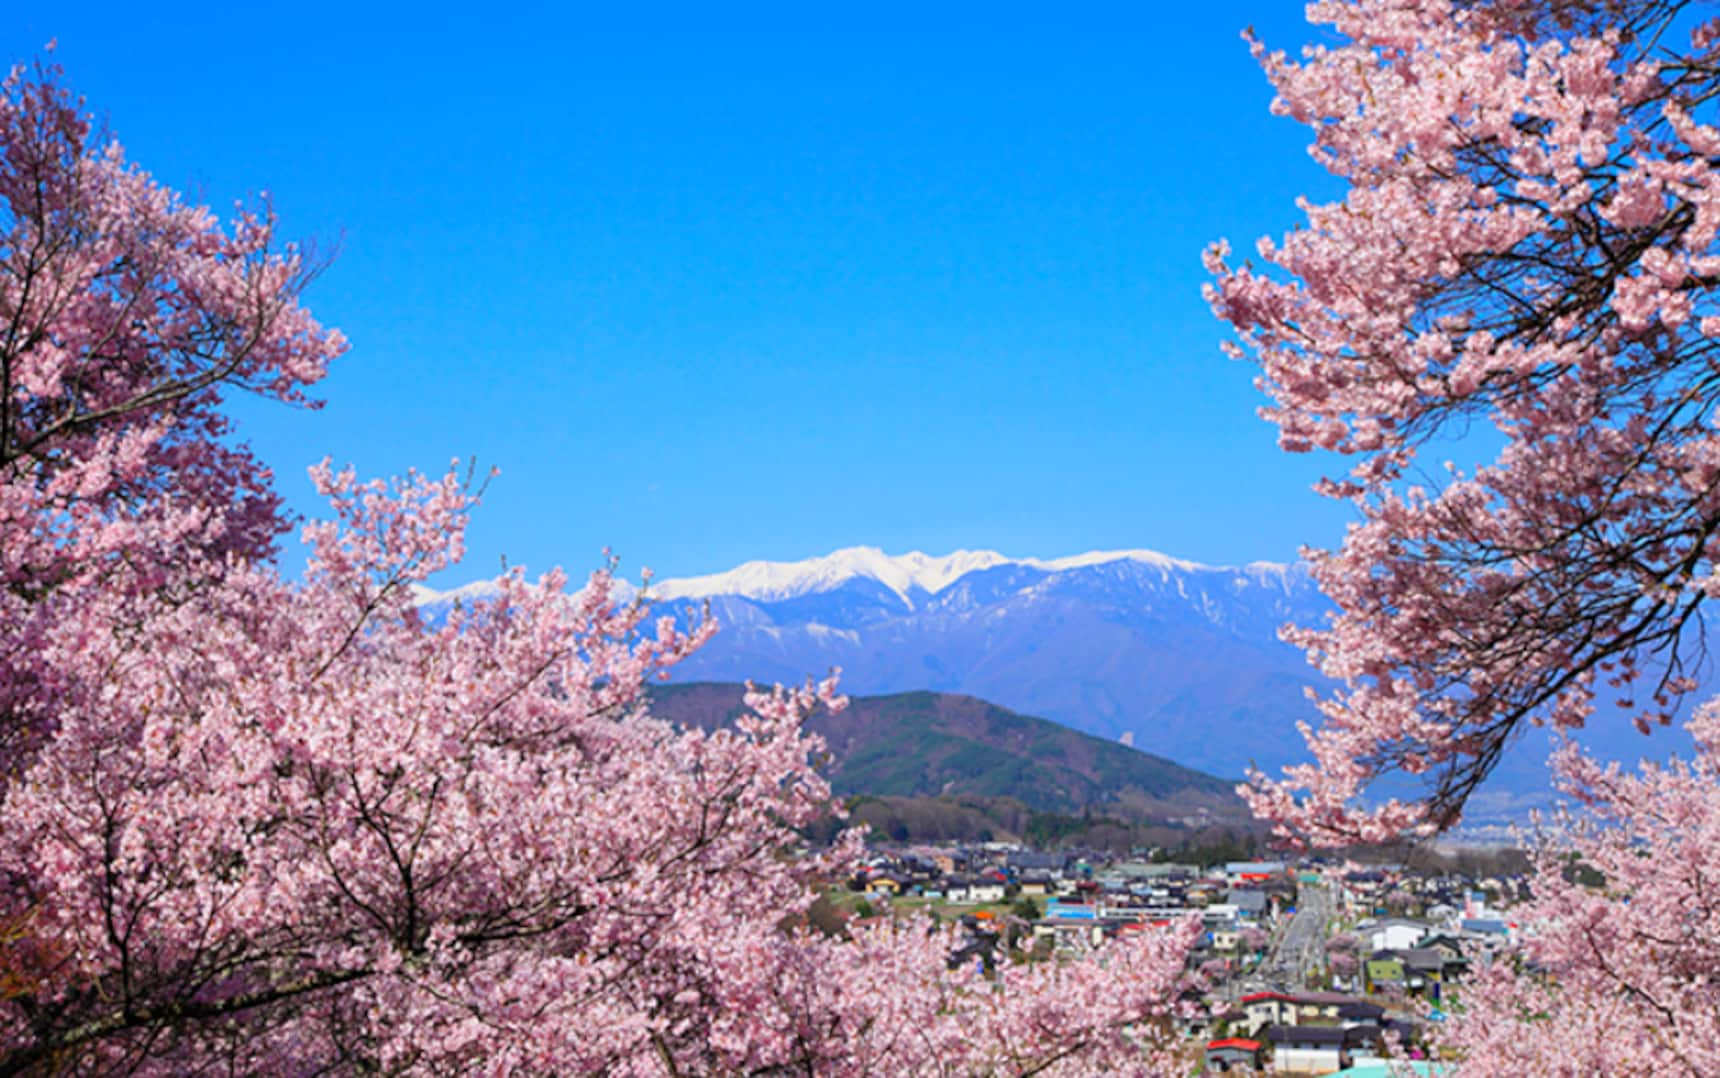 The Wonderful Seasons & Colors of Japan